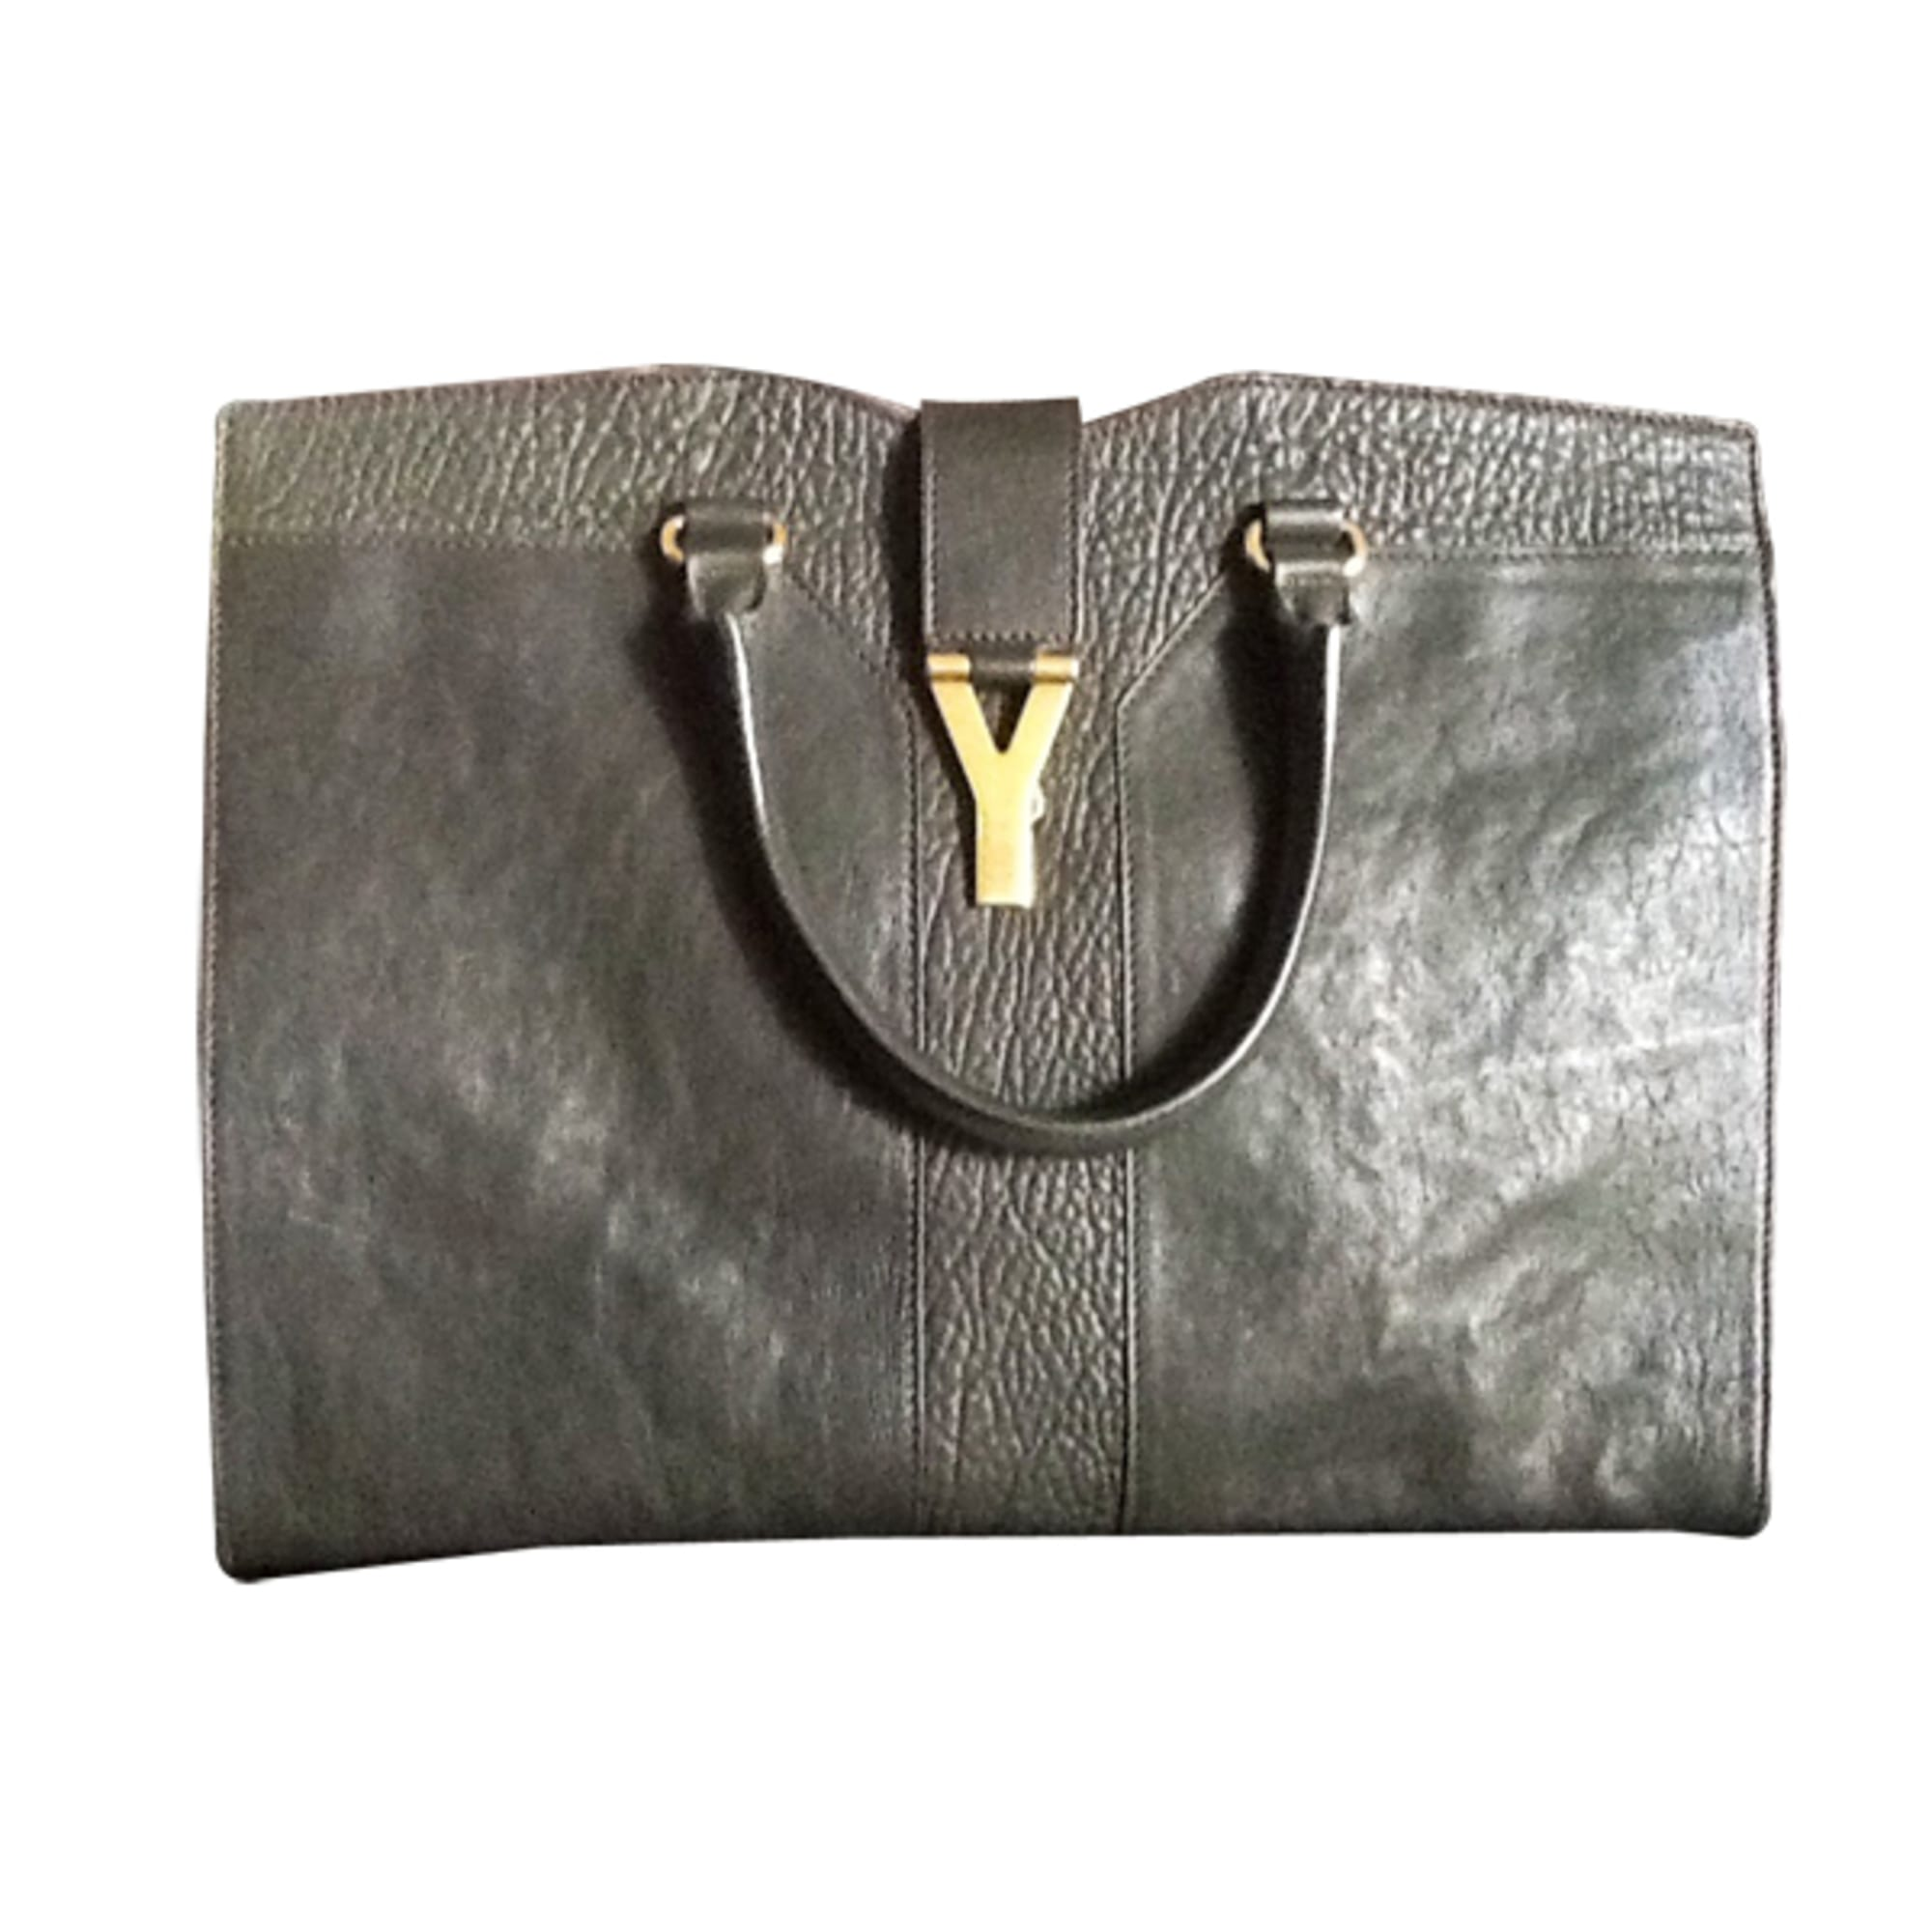 dea5bda31a Sac à main en cuir YVES SAINT LAURENT vert vendu par Chanel44922 ...